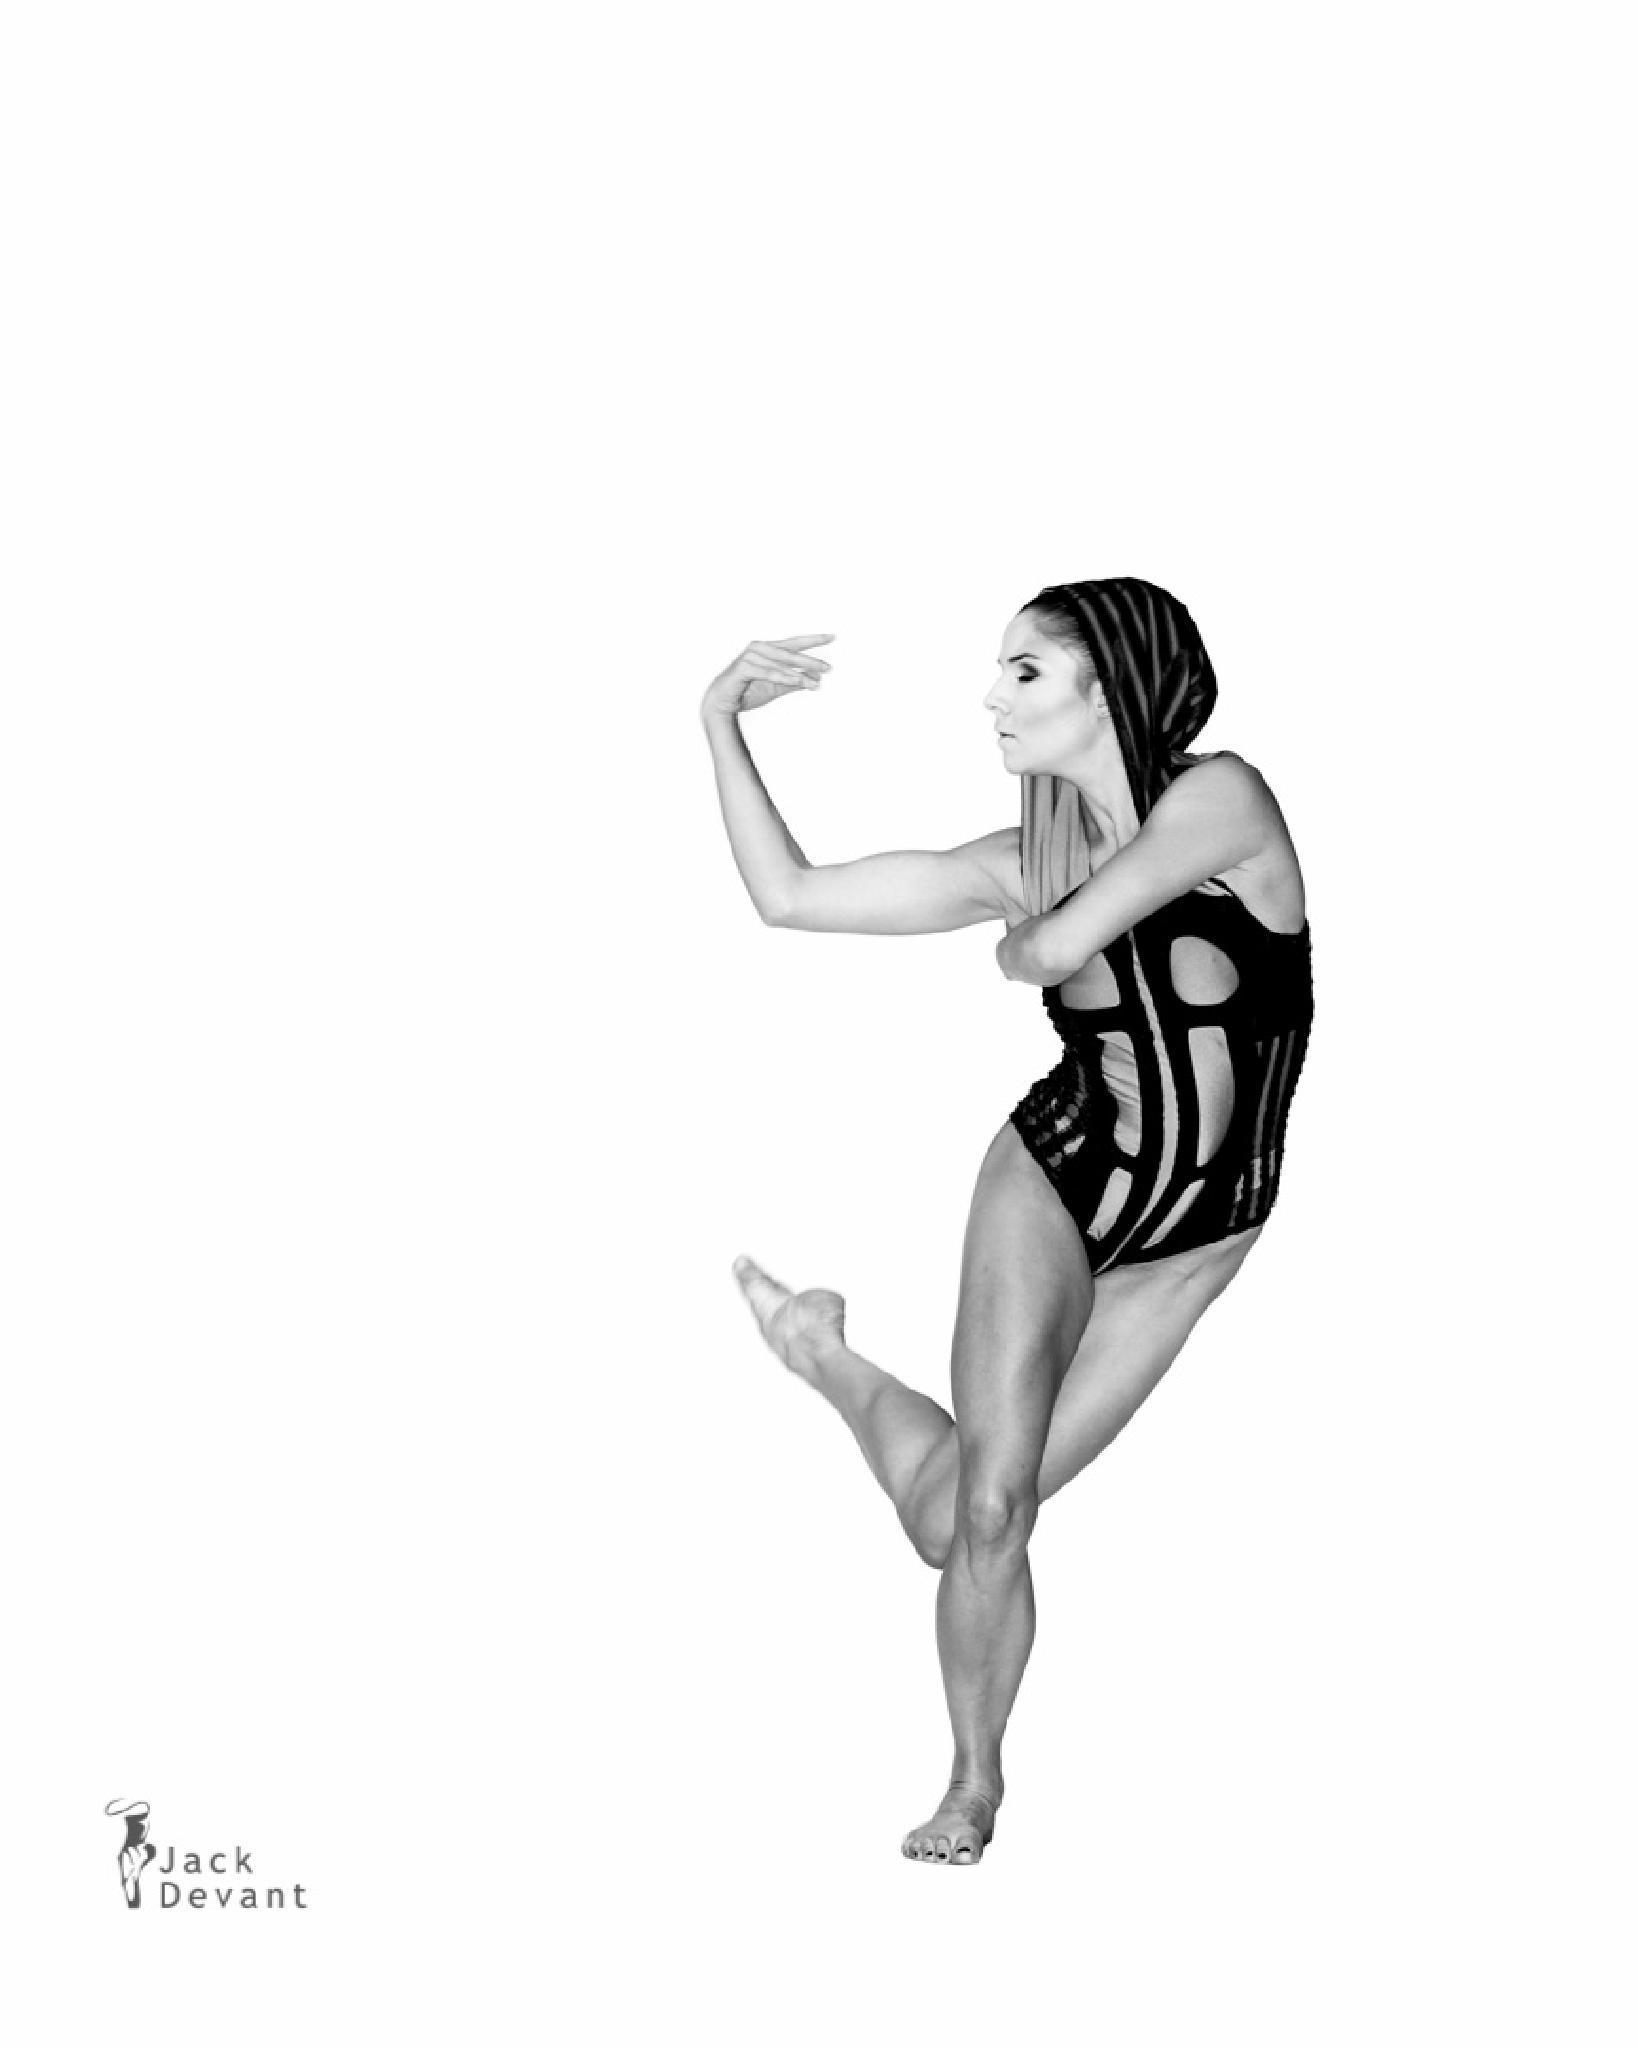 Maria Engel in GO by Jack Devant